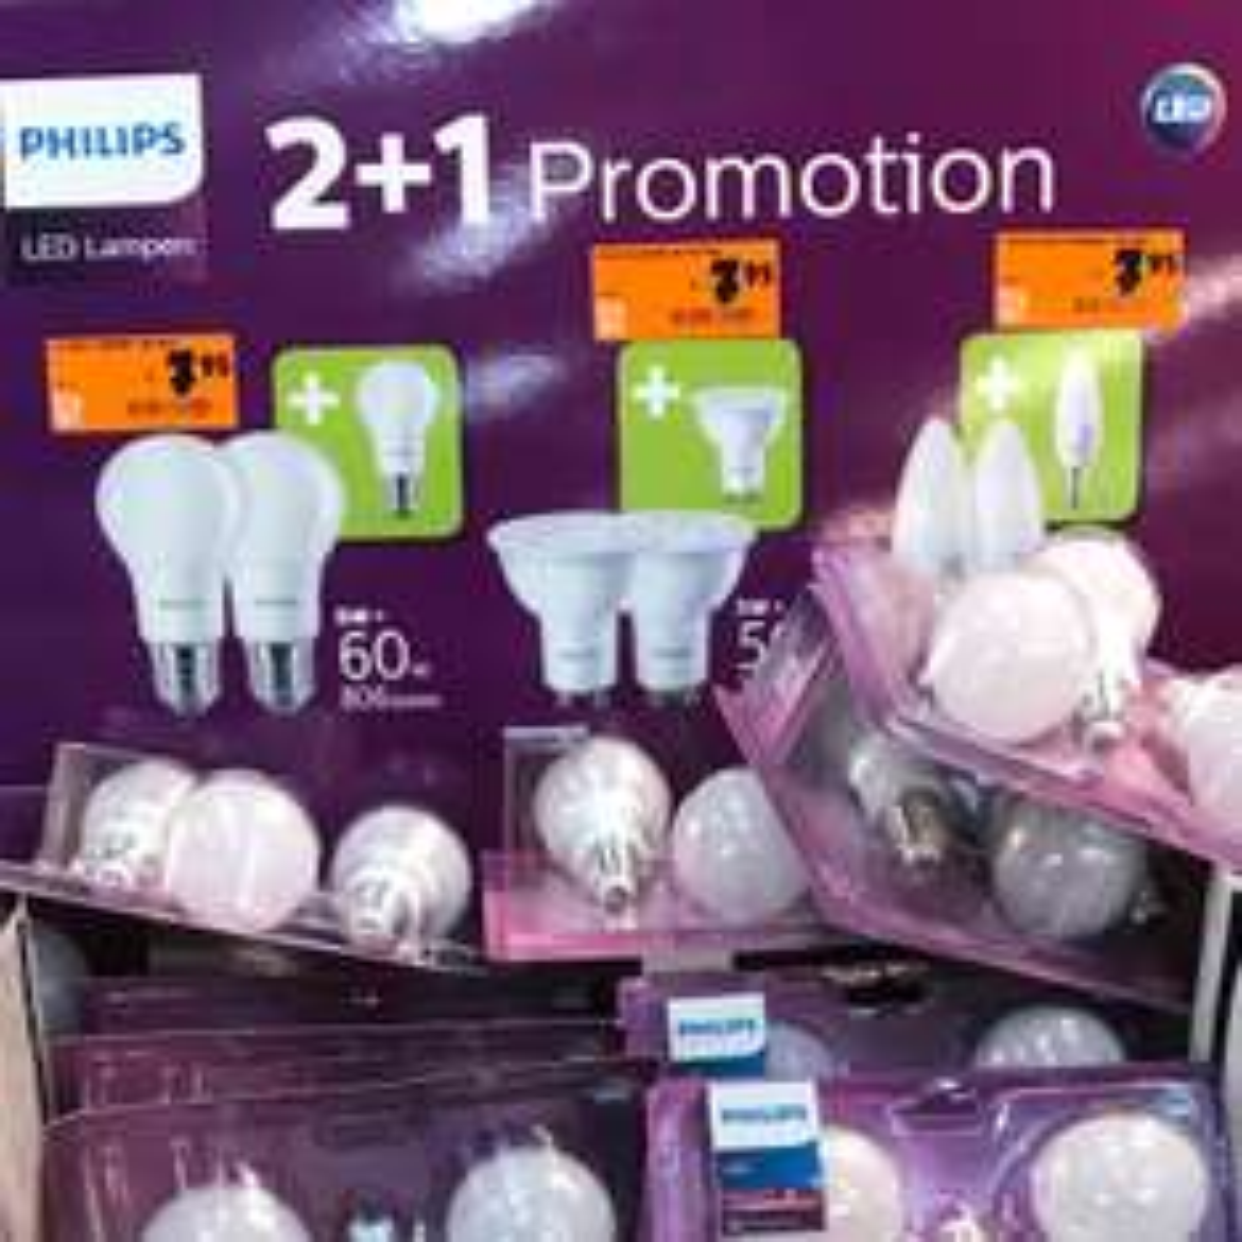 [ Hornbach Vogelsdorf ] Philips 3x 8w Led E27 806 Lumen